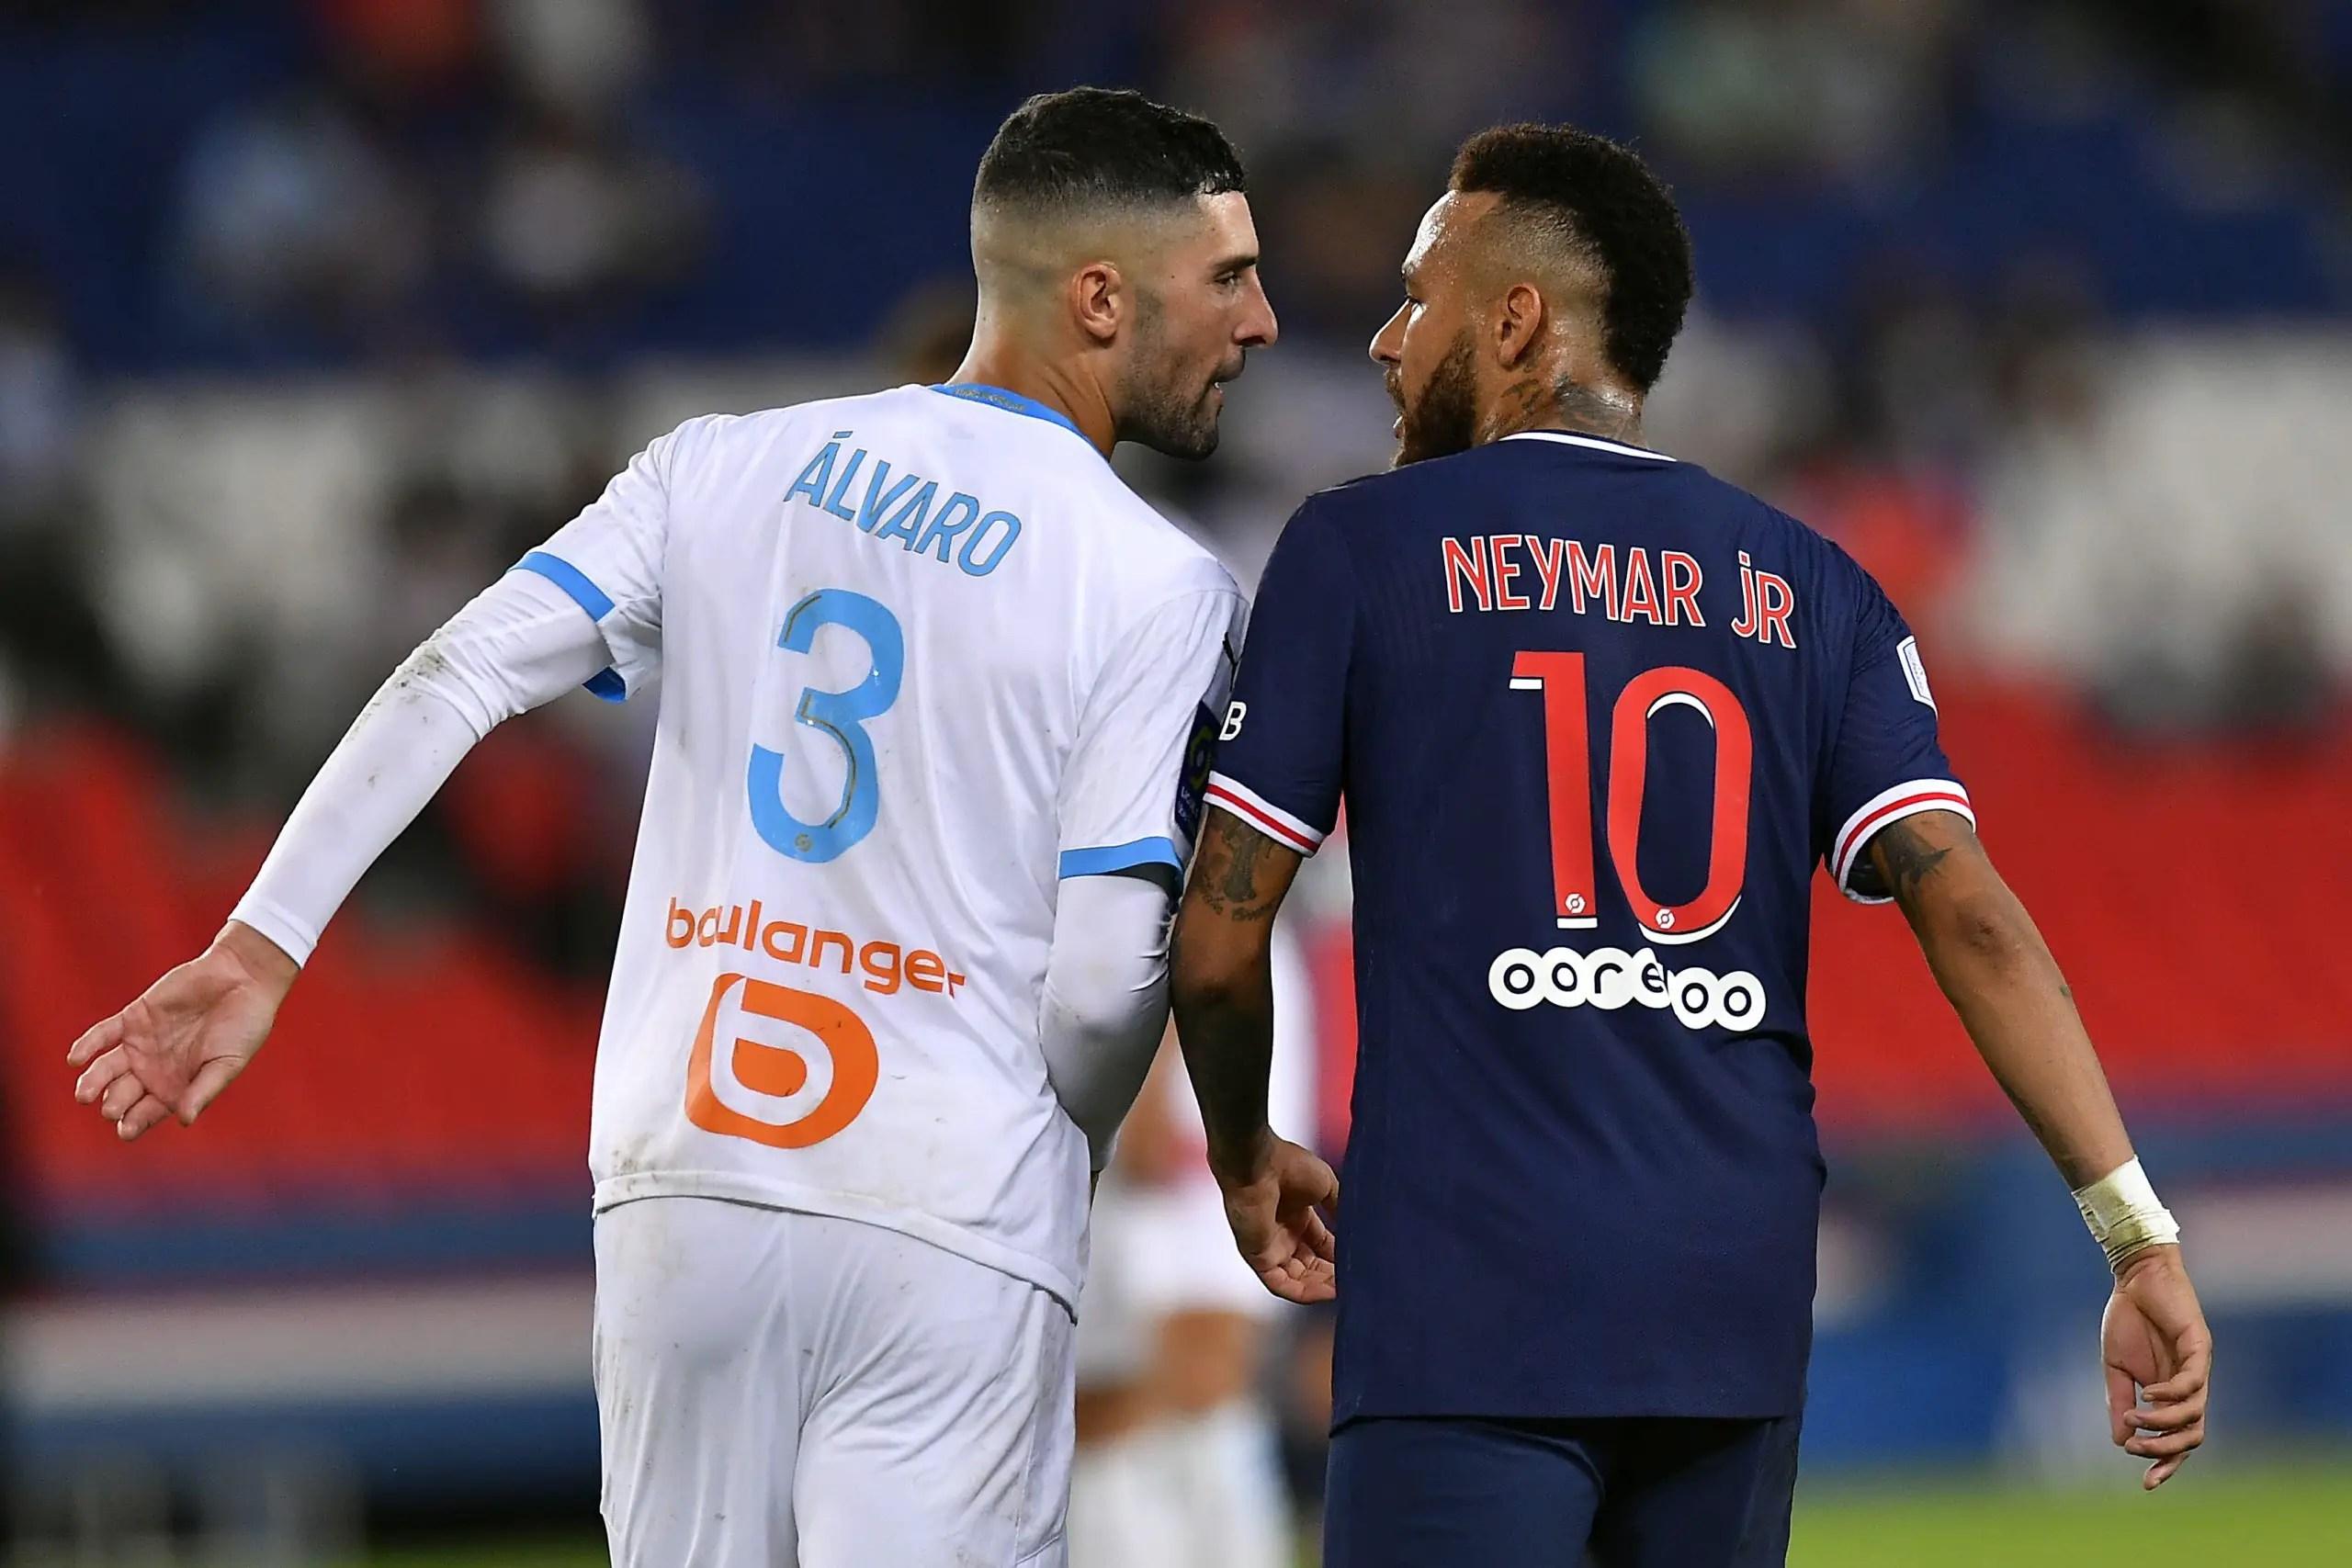 Neymar, Gonzalez In War Of Words After  Racism Allegation